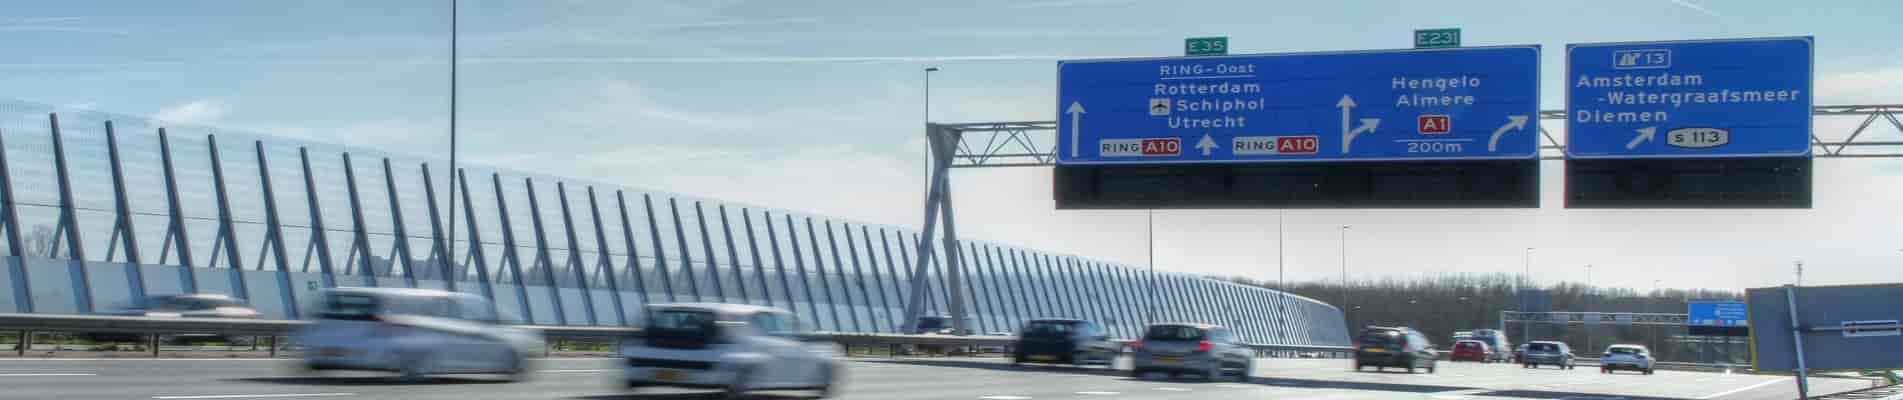 geluidoverlast snelweg, geluidsonderzoek